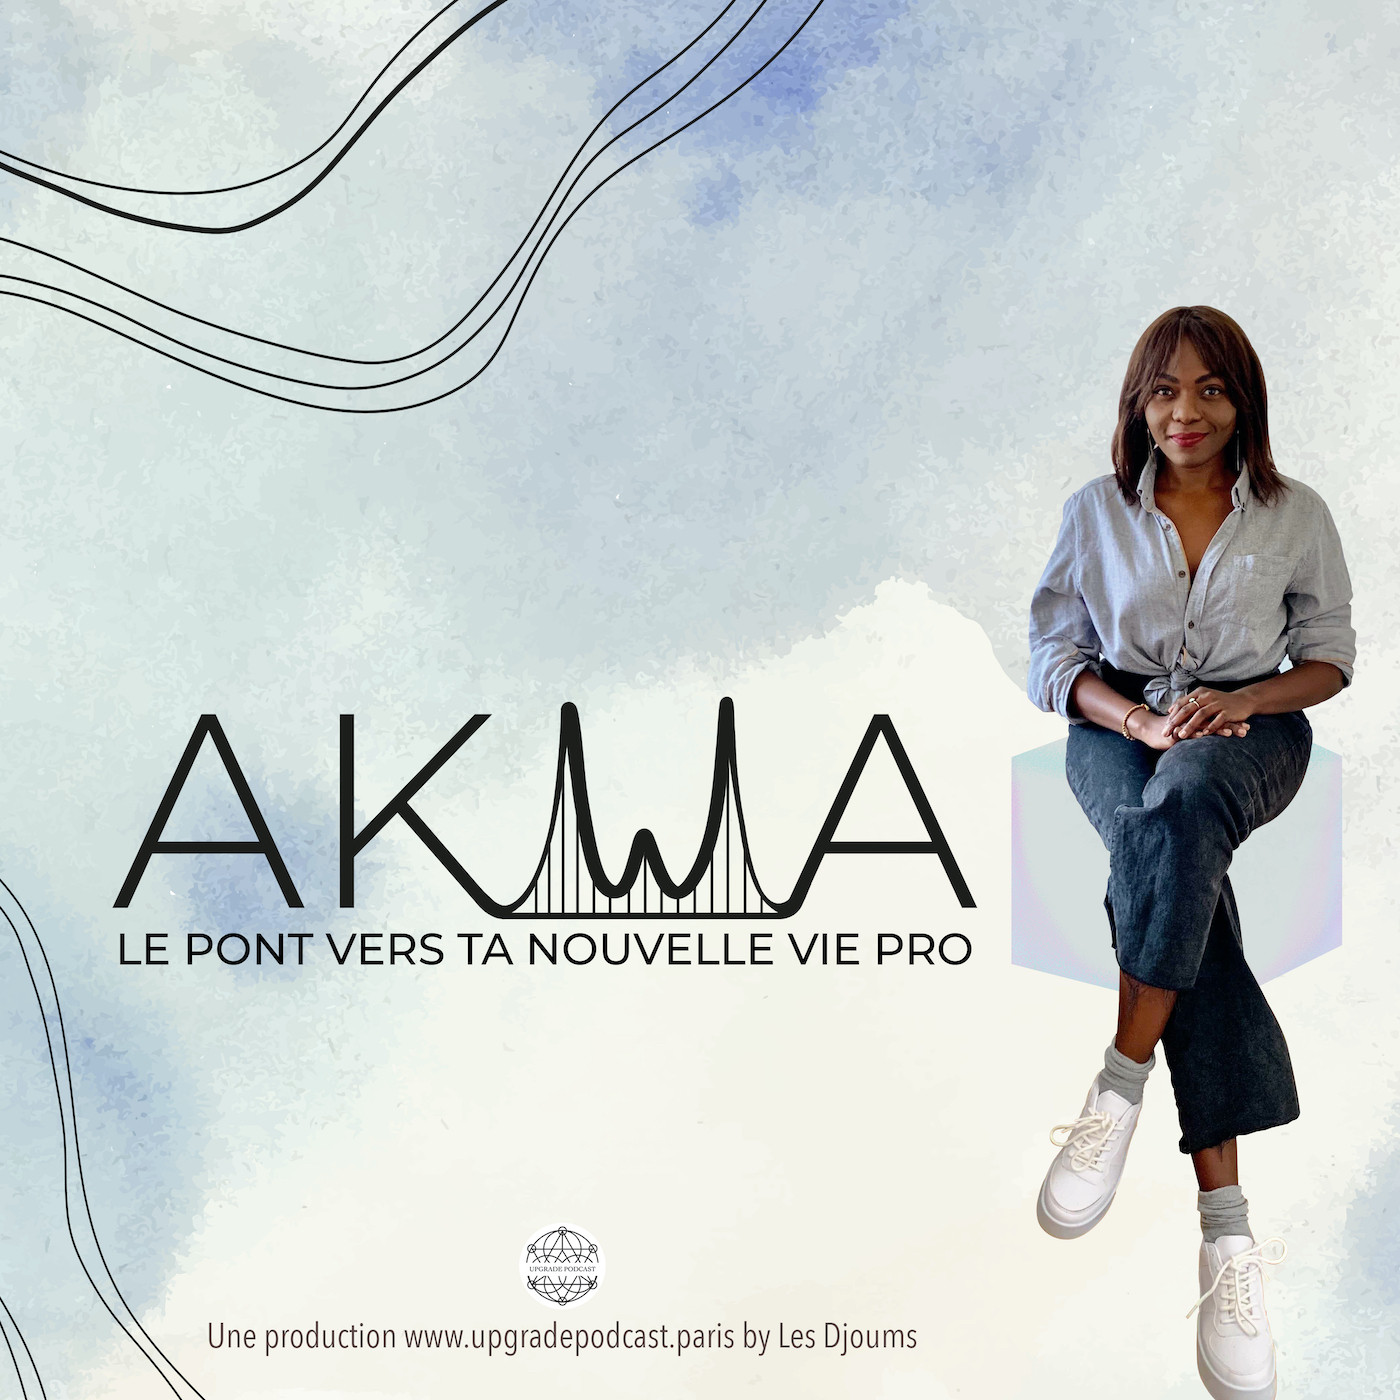 Akwa: le pont vers ta nouvelle vie pro